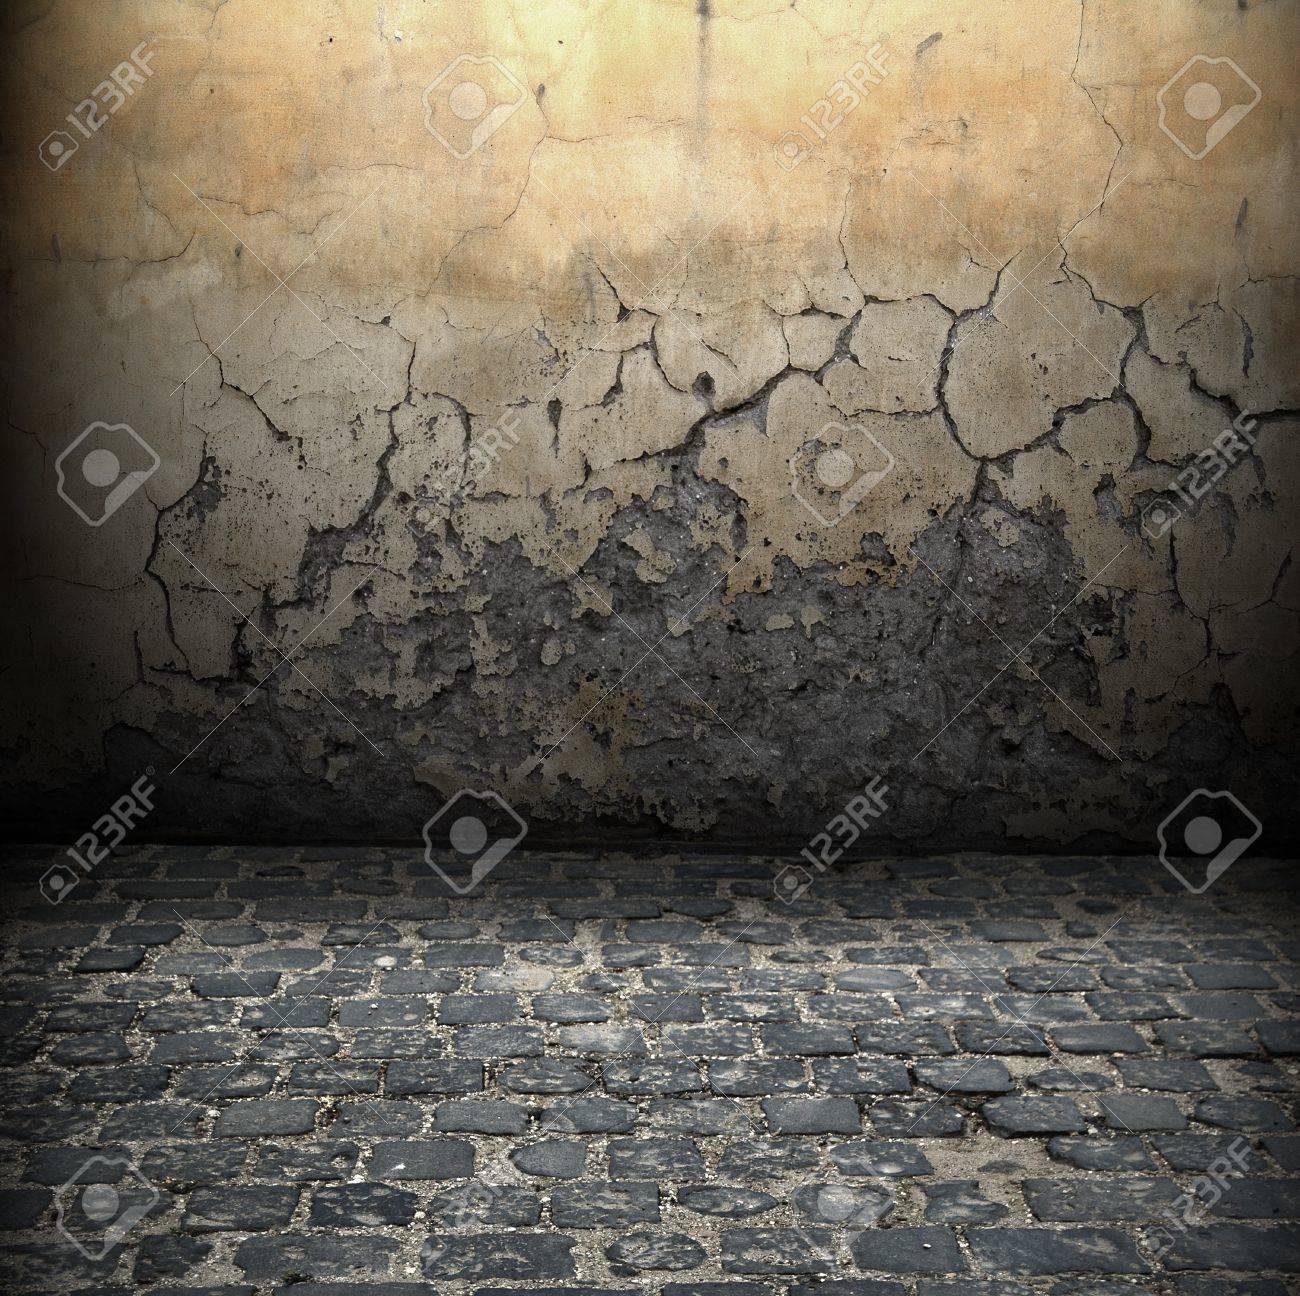 Dark Grunge Room Digital background for studio photographers - 14875190